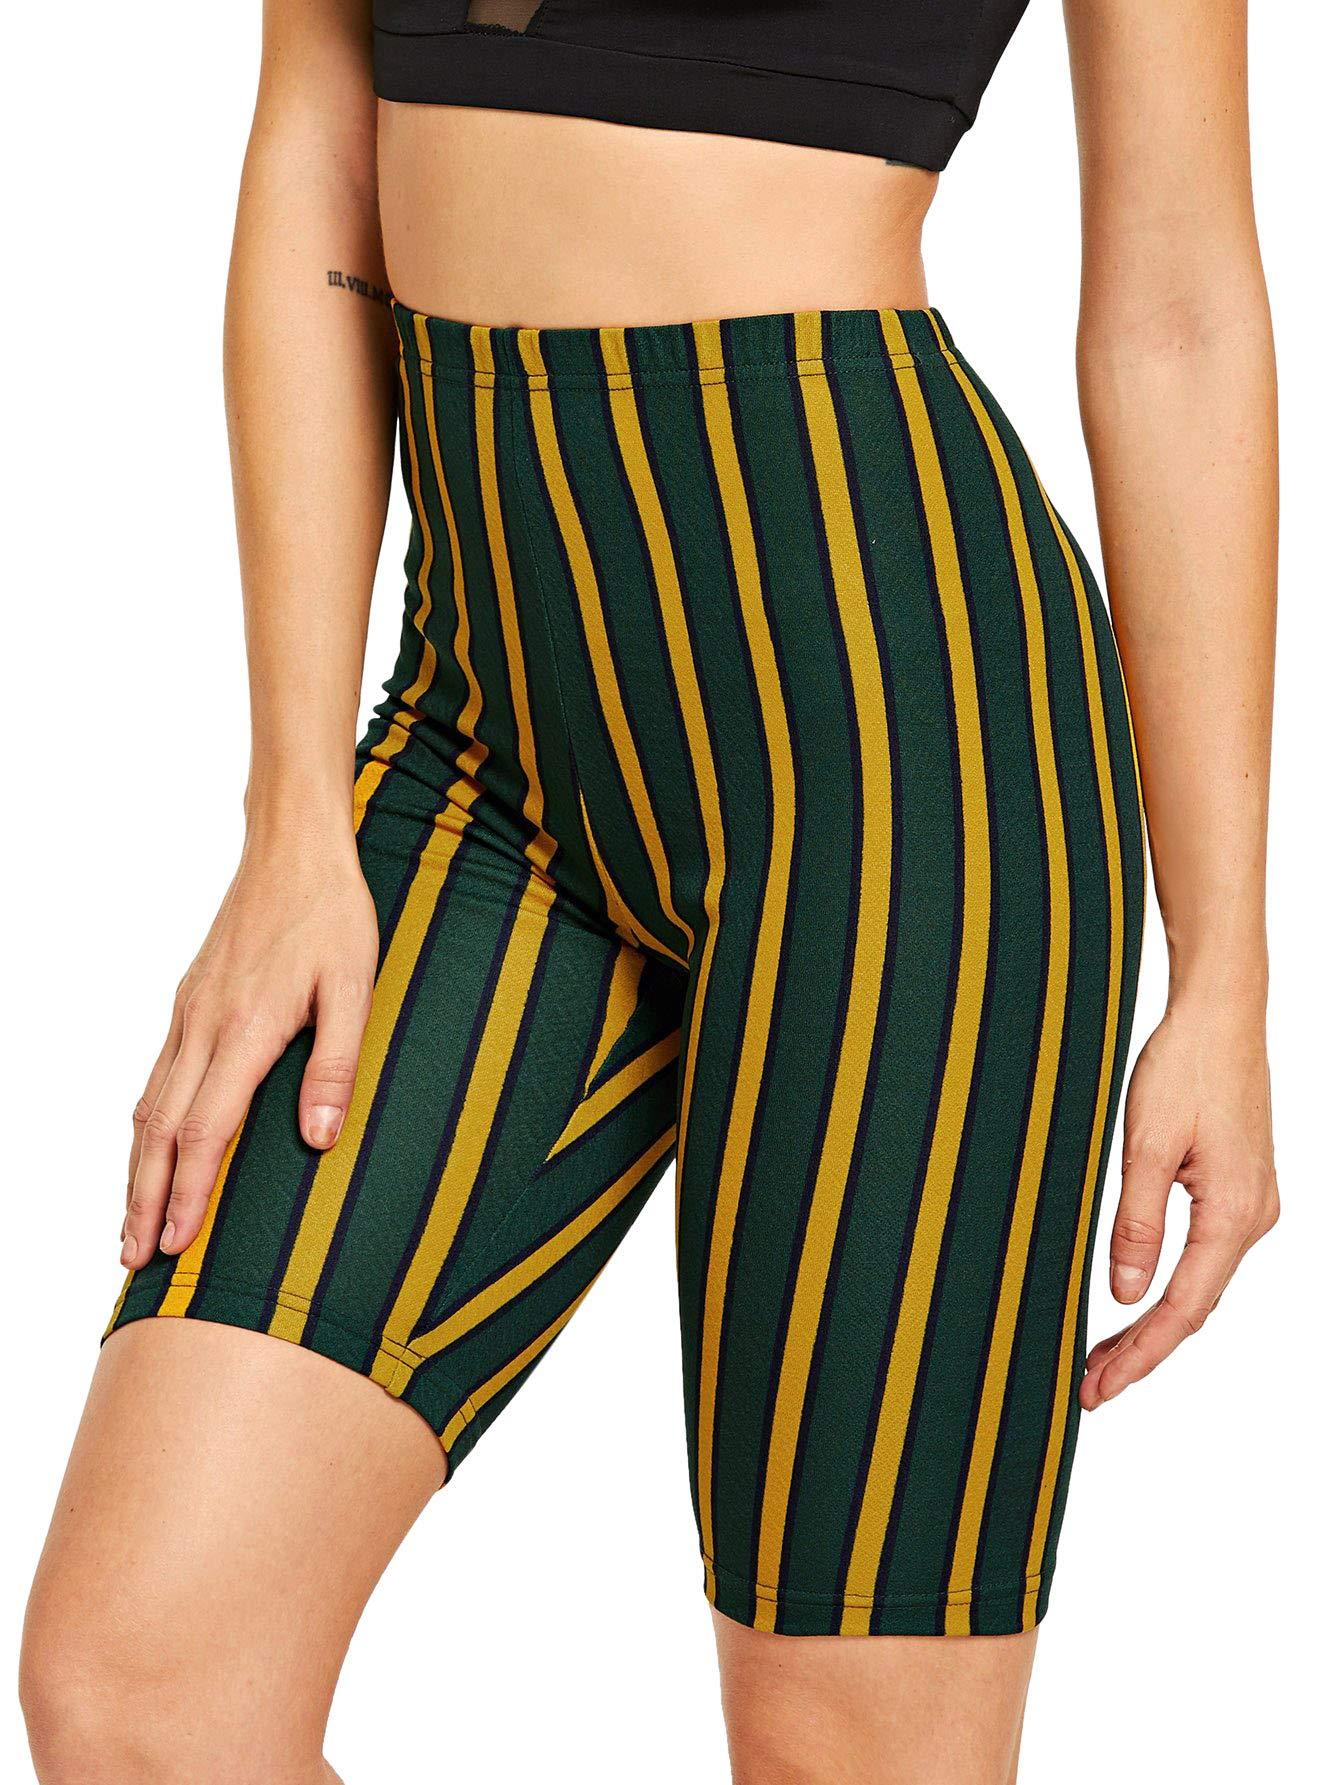 SweatyRocks Women's Sexy Lace Trim Slip Shorts Yoga Bike Active Short Leggings (Large, Green_Mustard)